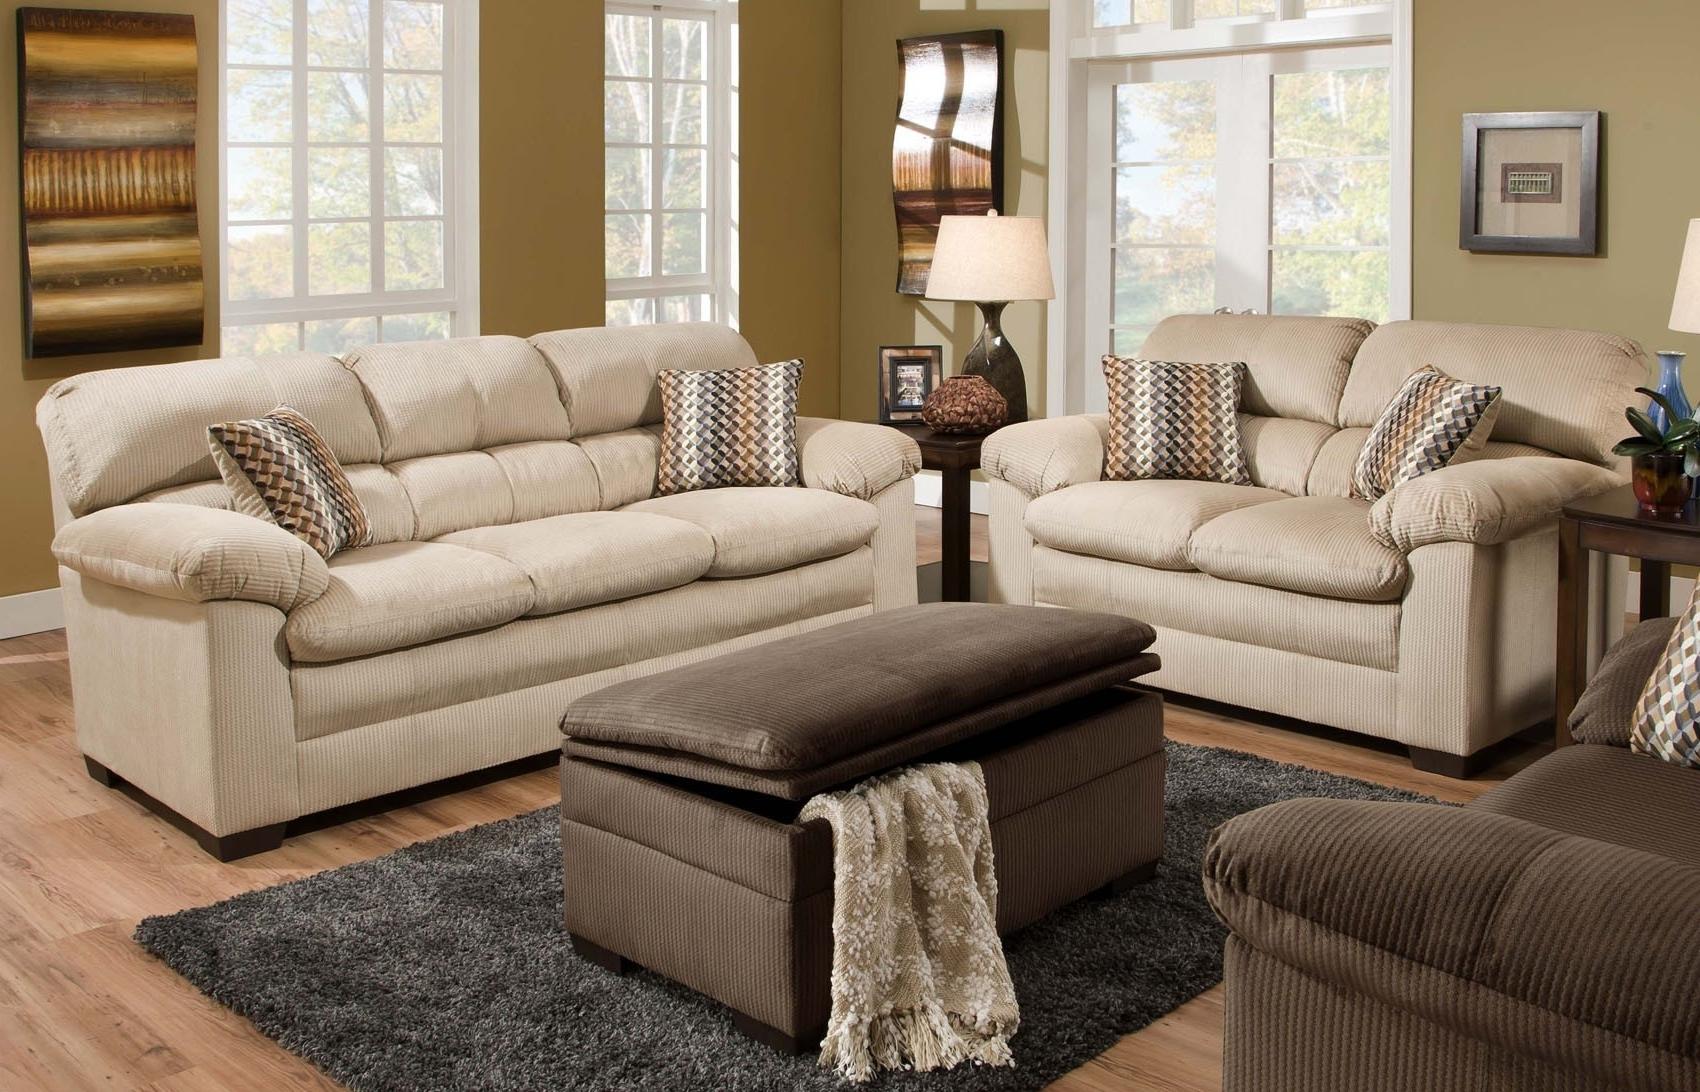 Lakewood Oversized Sofa & Loveseat Set (Beige) (View 4 of 15)